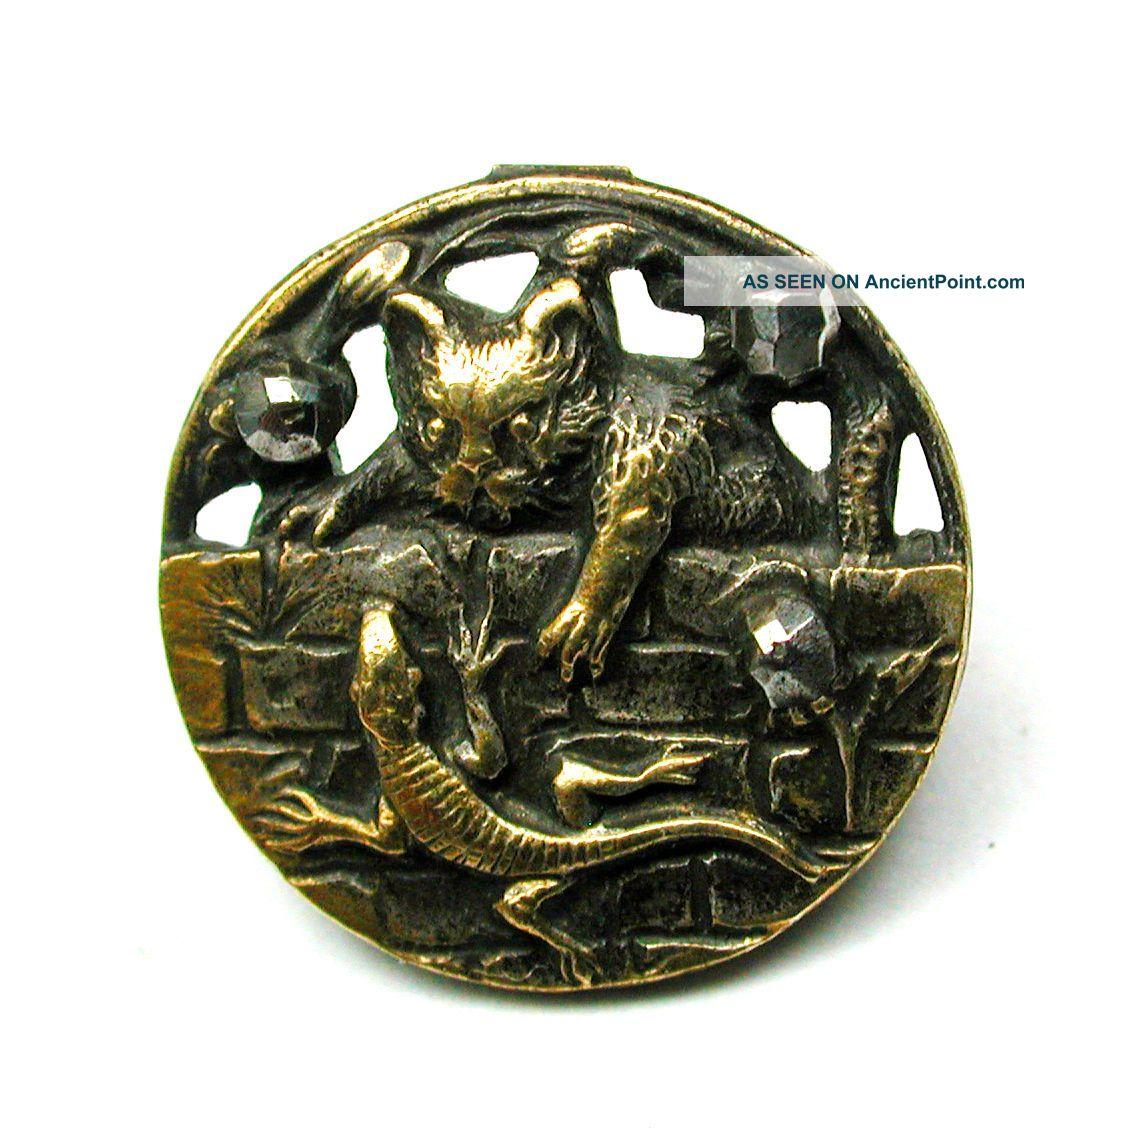 Antique Pierced Brass Button Cat & Lizard On Wall W/ Steel Accents - 1/2